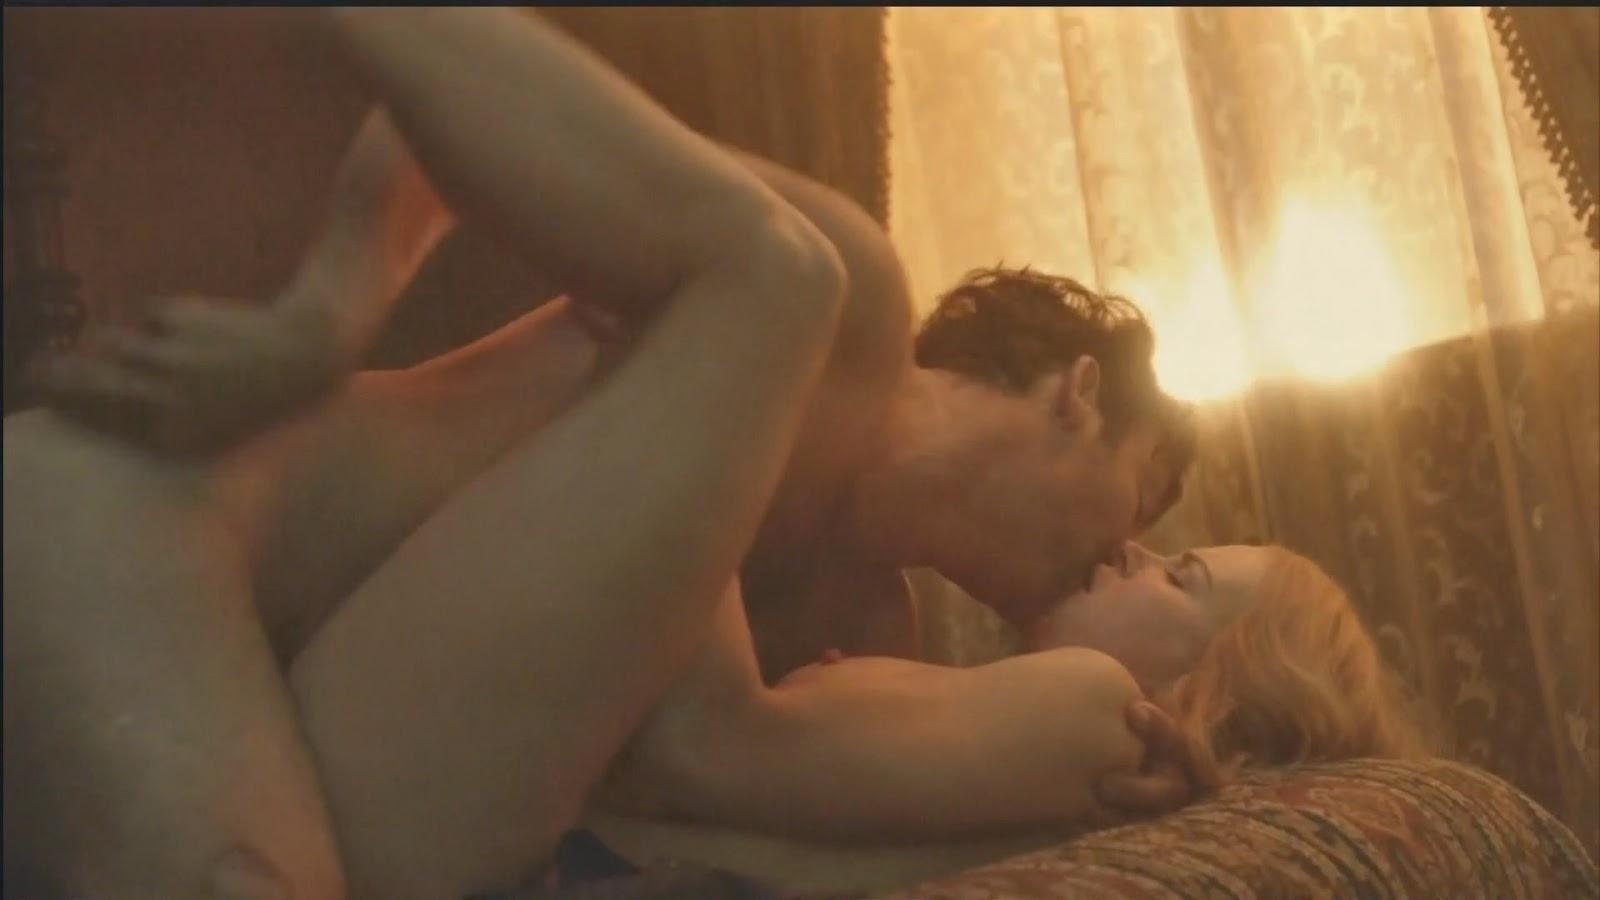 stseni-seksa-v-kinofilmah